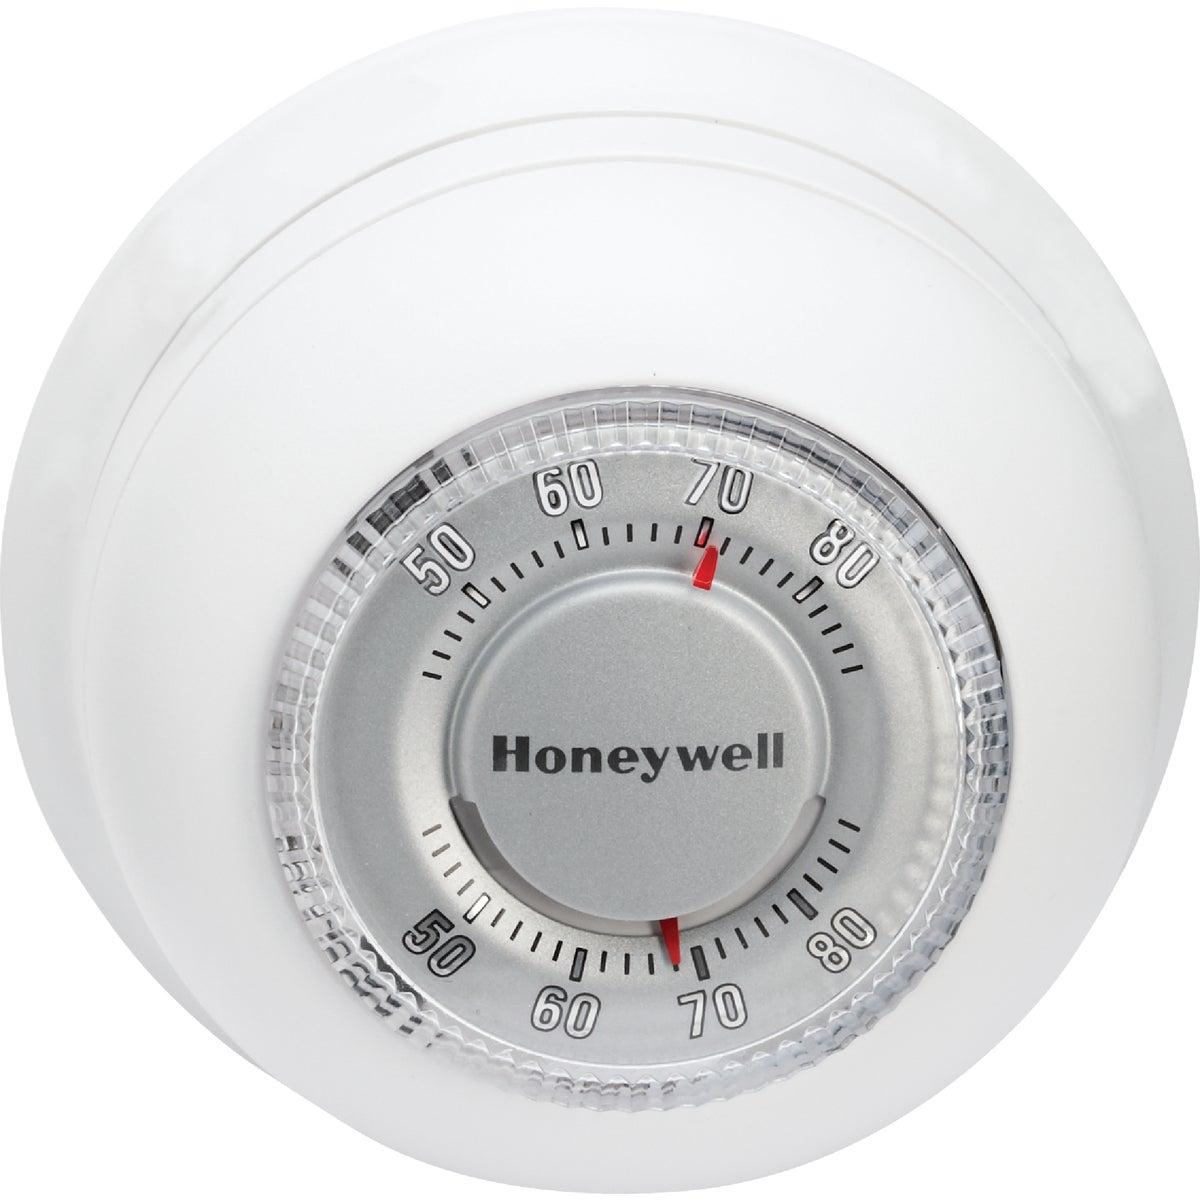 Honeywell International RND HEAT ONLY THERMOSTAT T87K1007